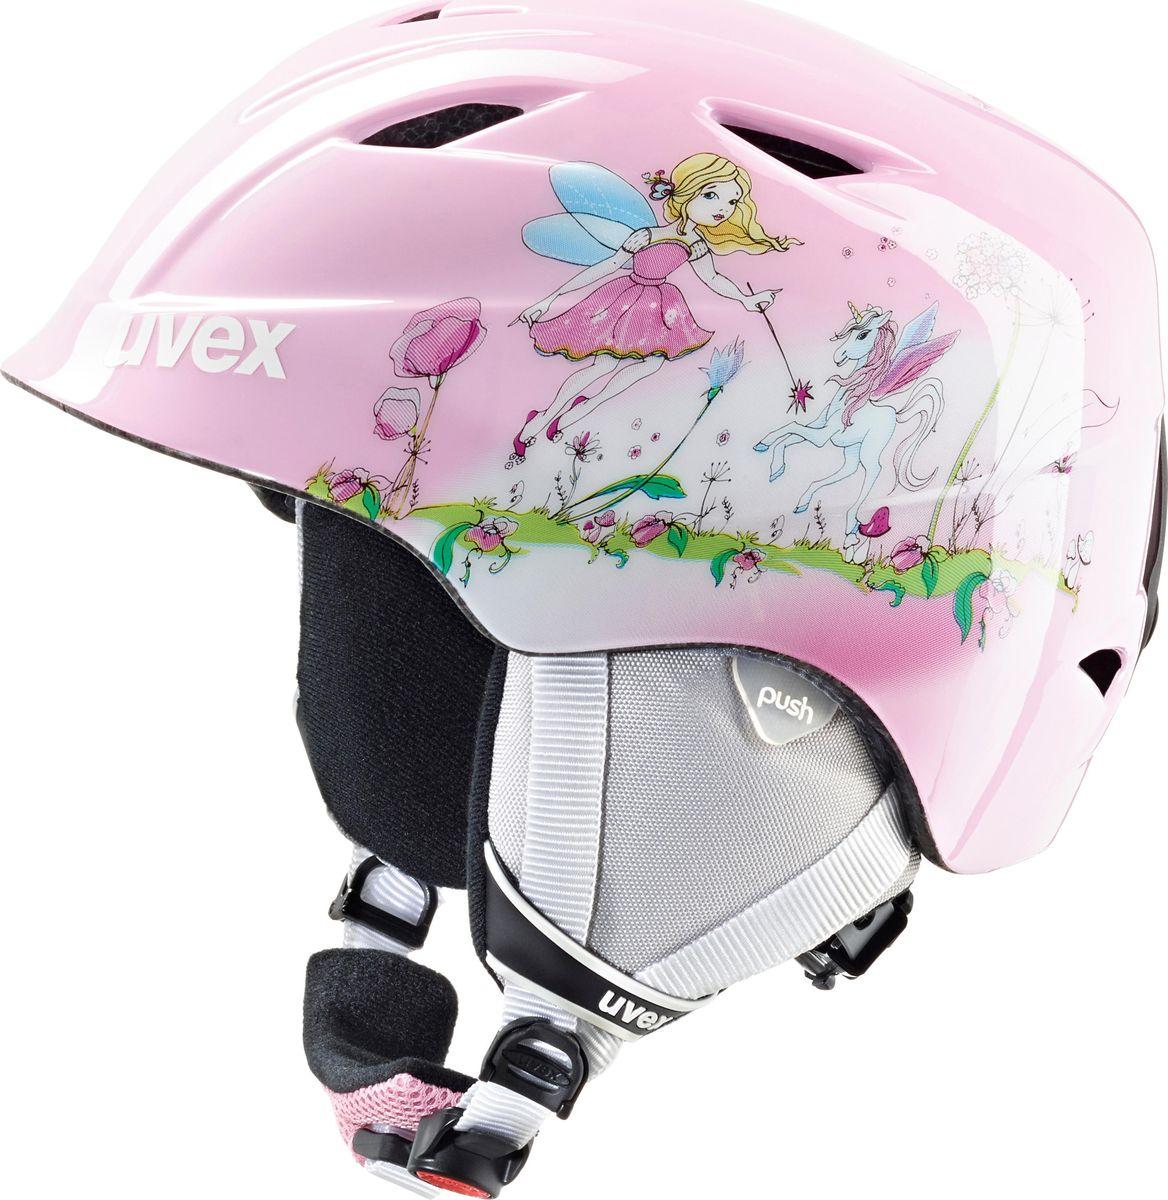 Шлем горнолыжный Uvex  Airwing 2 Kid's Helmet , фе. Размер S - Горные лыжи